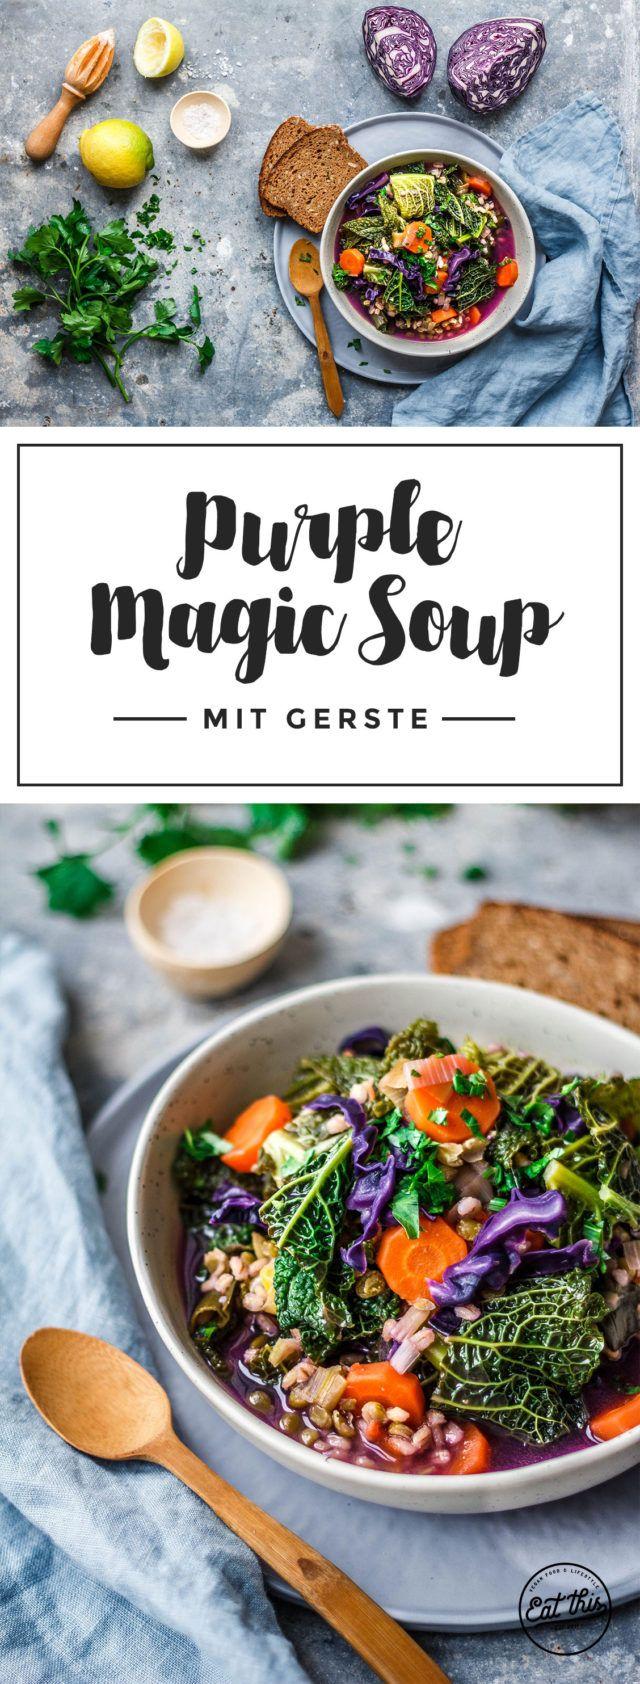 60 best Rezepte - Chutney, Eingewecktes images on Pinterest ...